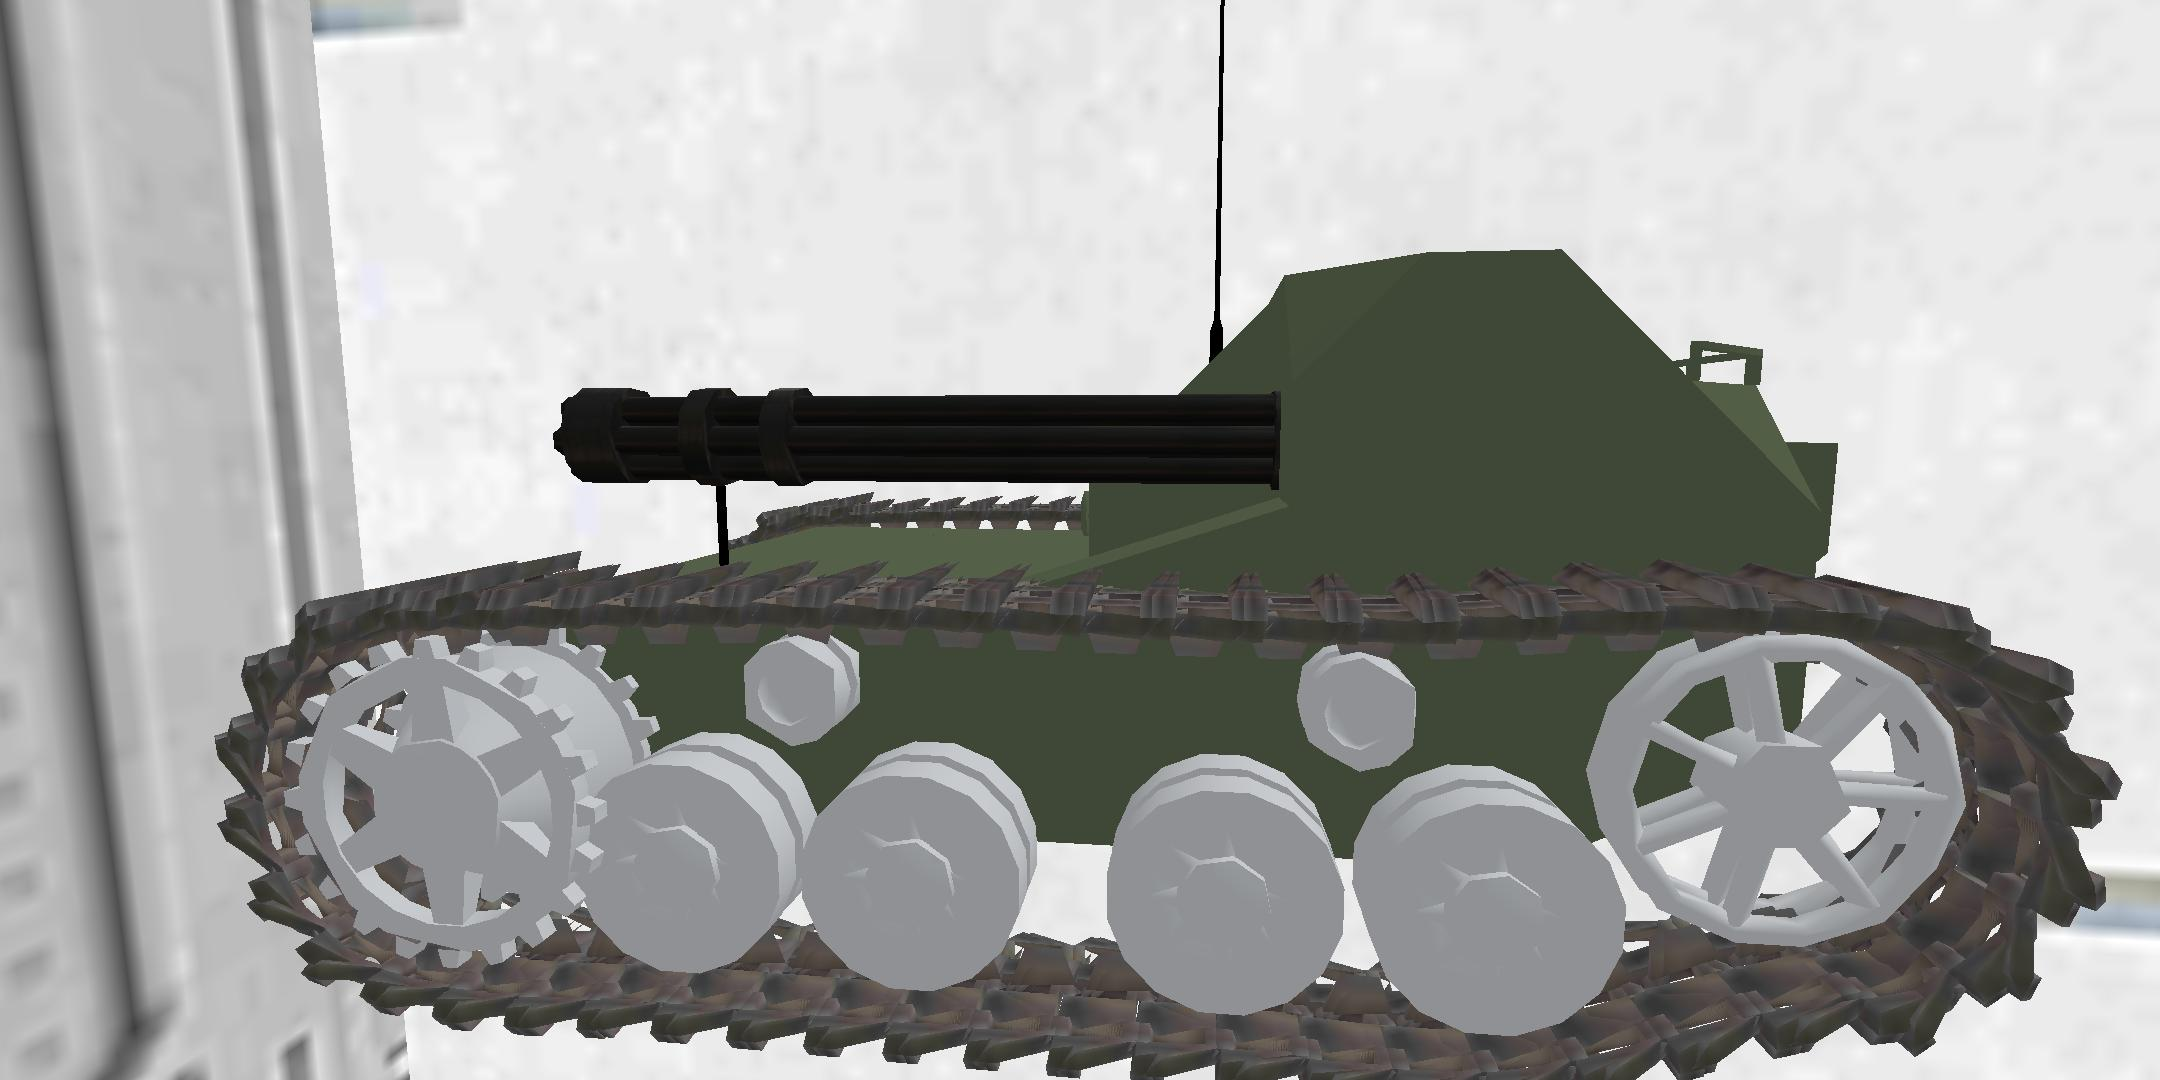 KMT Carden-Loyd Mk.IX